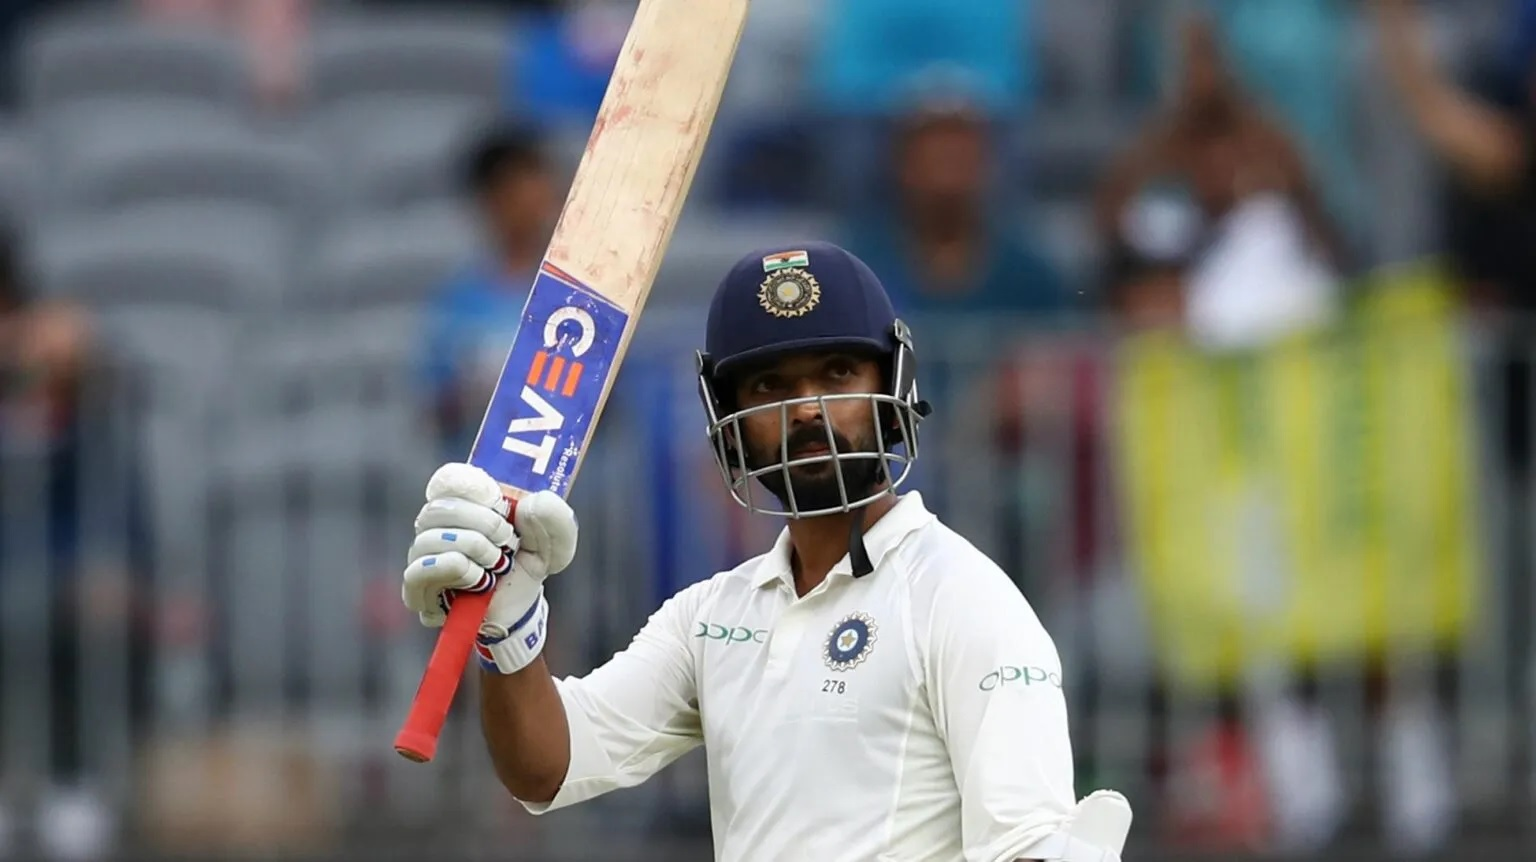 IND vs NZ, 1st TEST: নিউজিল্যান্ডের বিরুদ্ধে প্রথম টেস্টে এই হল ভারতের প্রথম একাদশ, দীর্ঘদিন পর ইনি পেলেন জায়গা 5